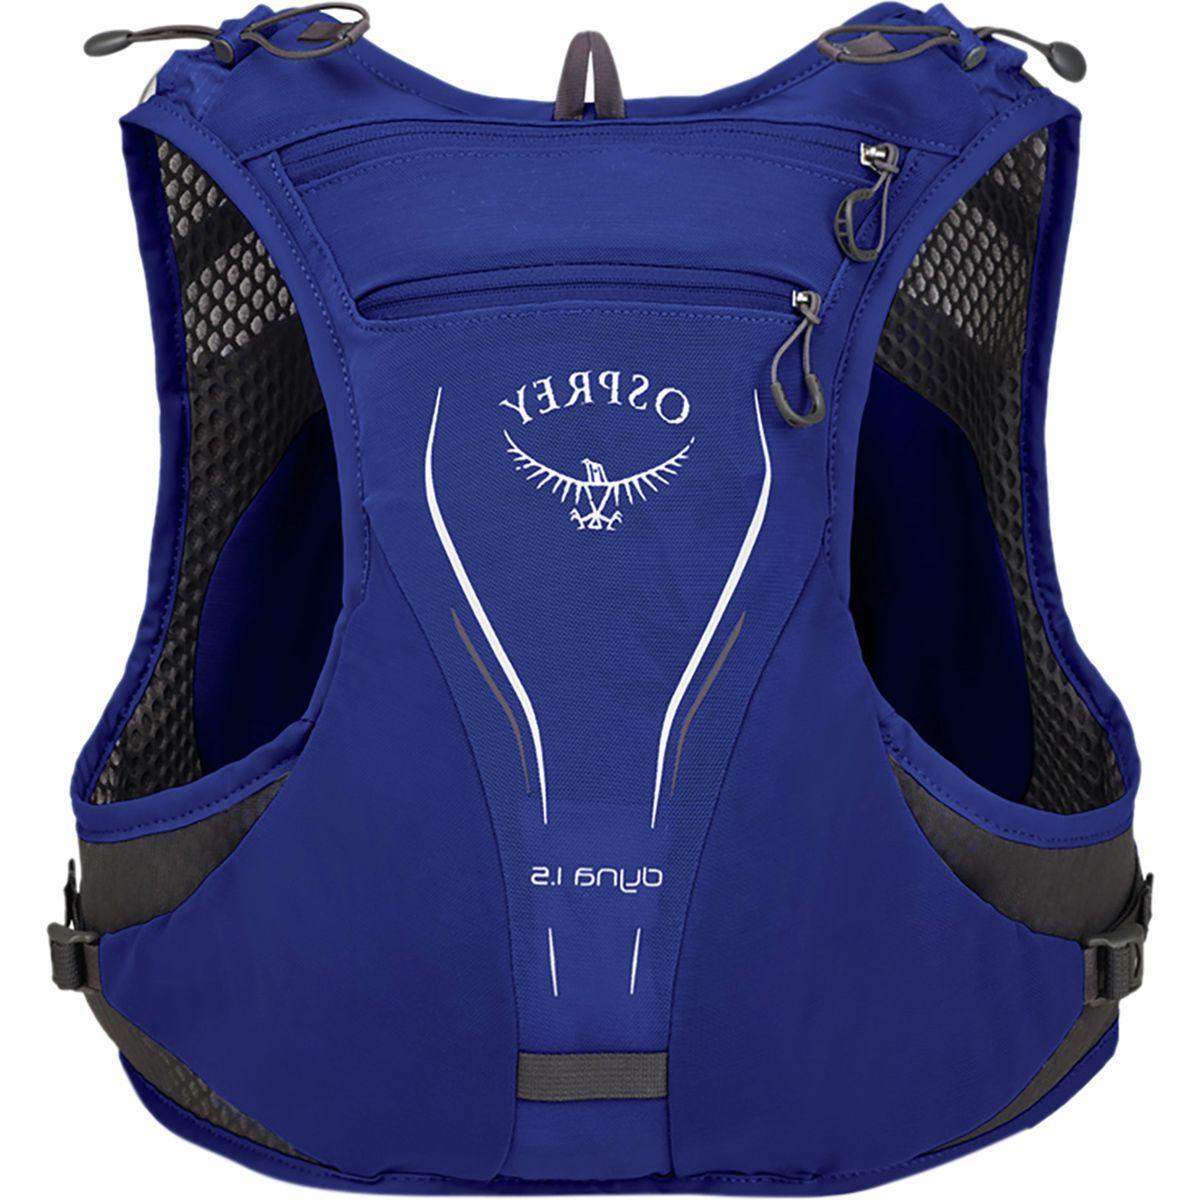 Osprey Packs Dyna 1.5L Backpack - Women's